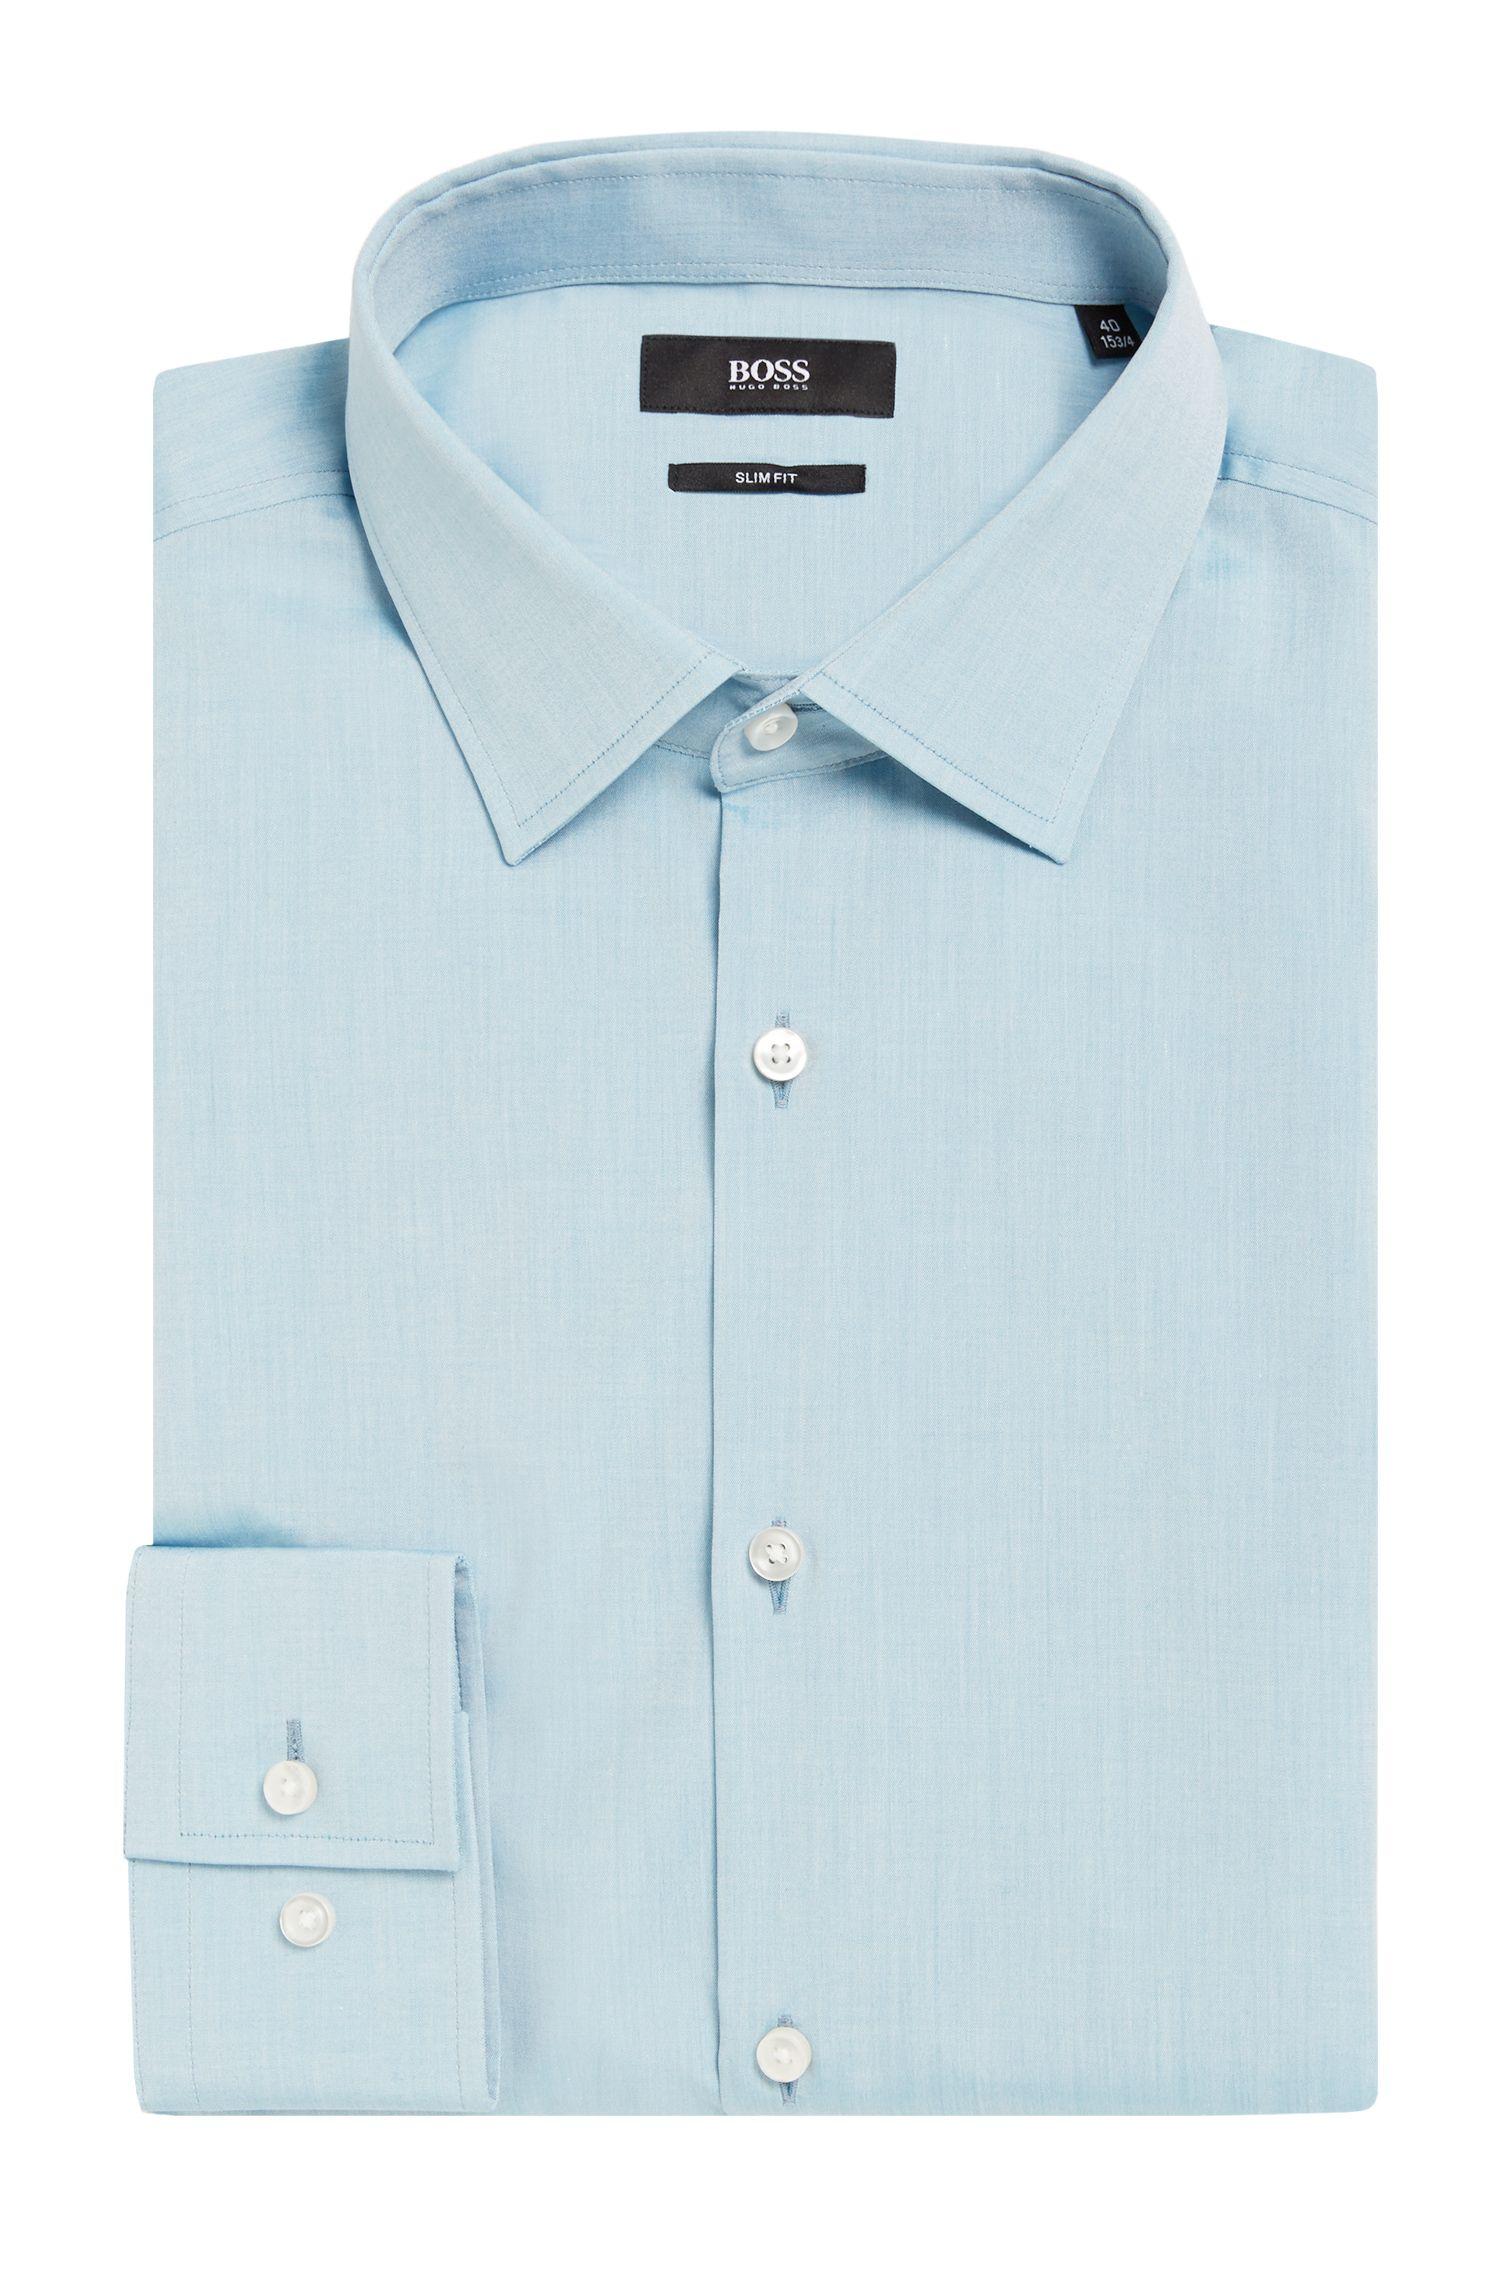 'Jenno' | Slim Fit, Italian Cotton Dress Shirt